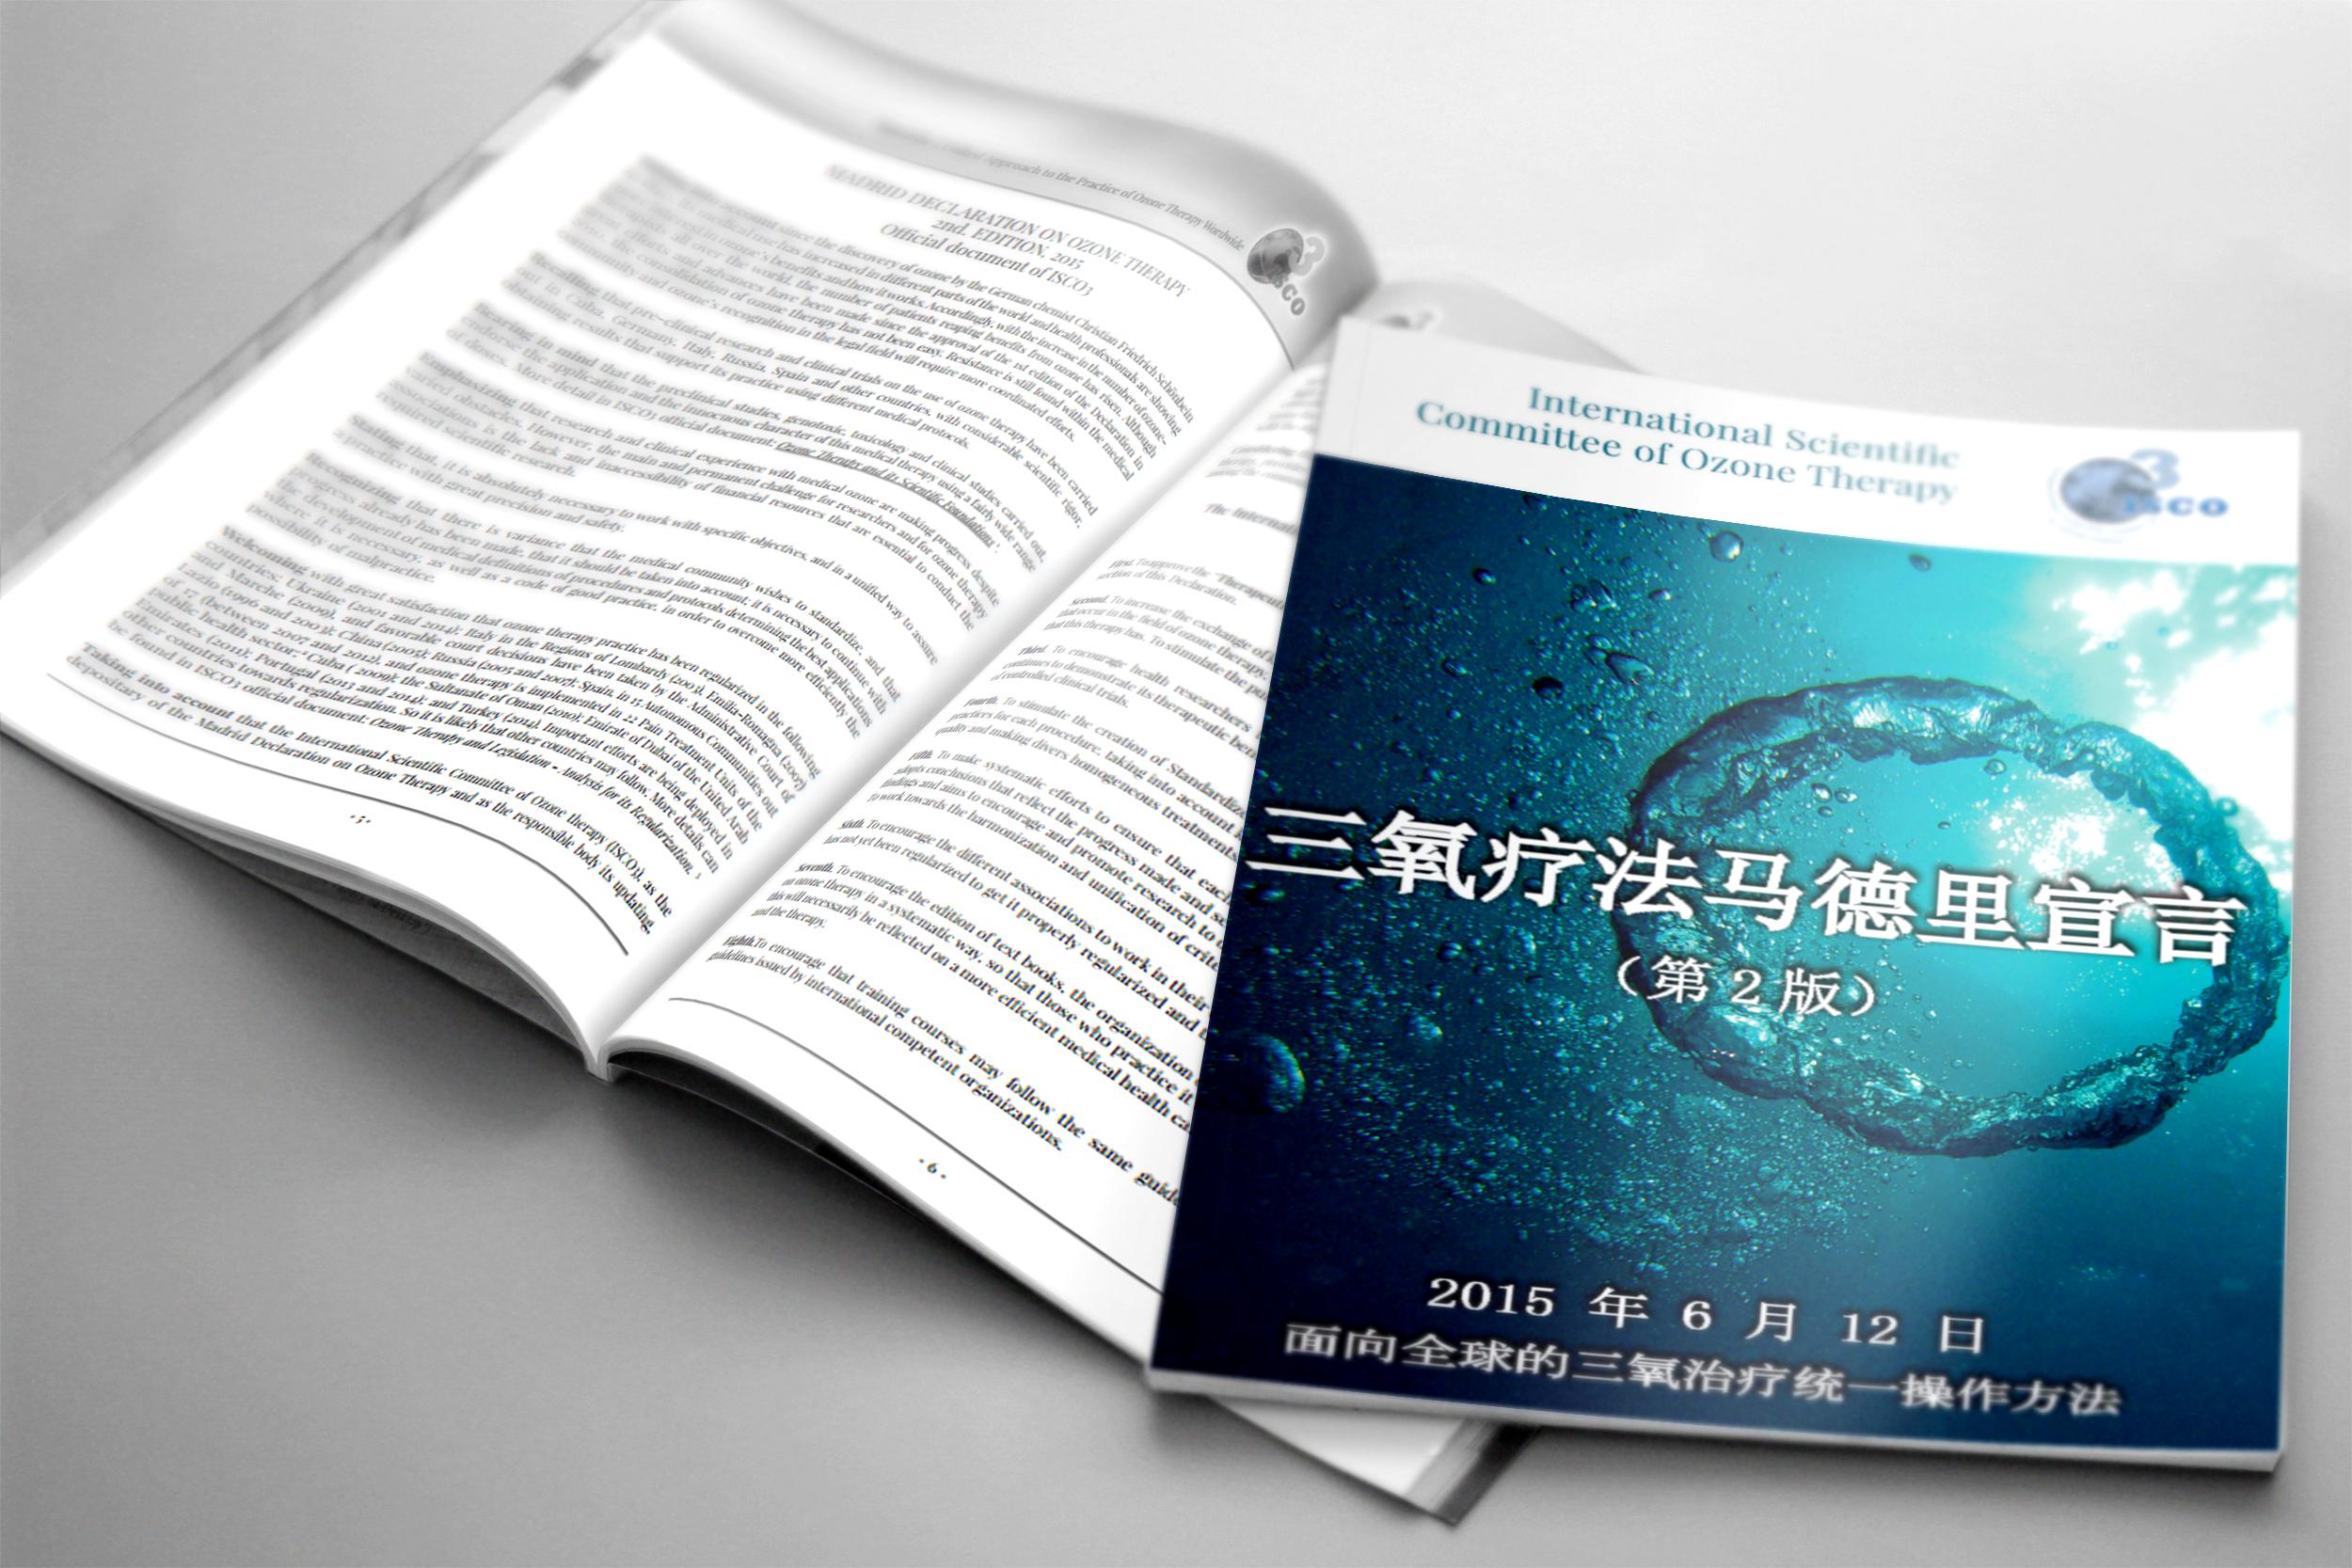 MOCK UP DECLARACION ABIERTA - CHINA